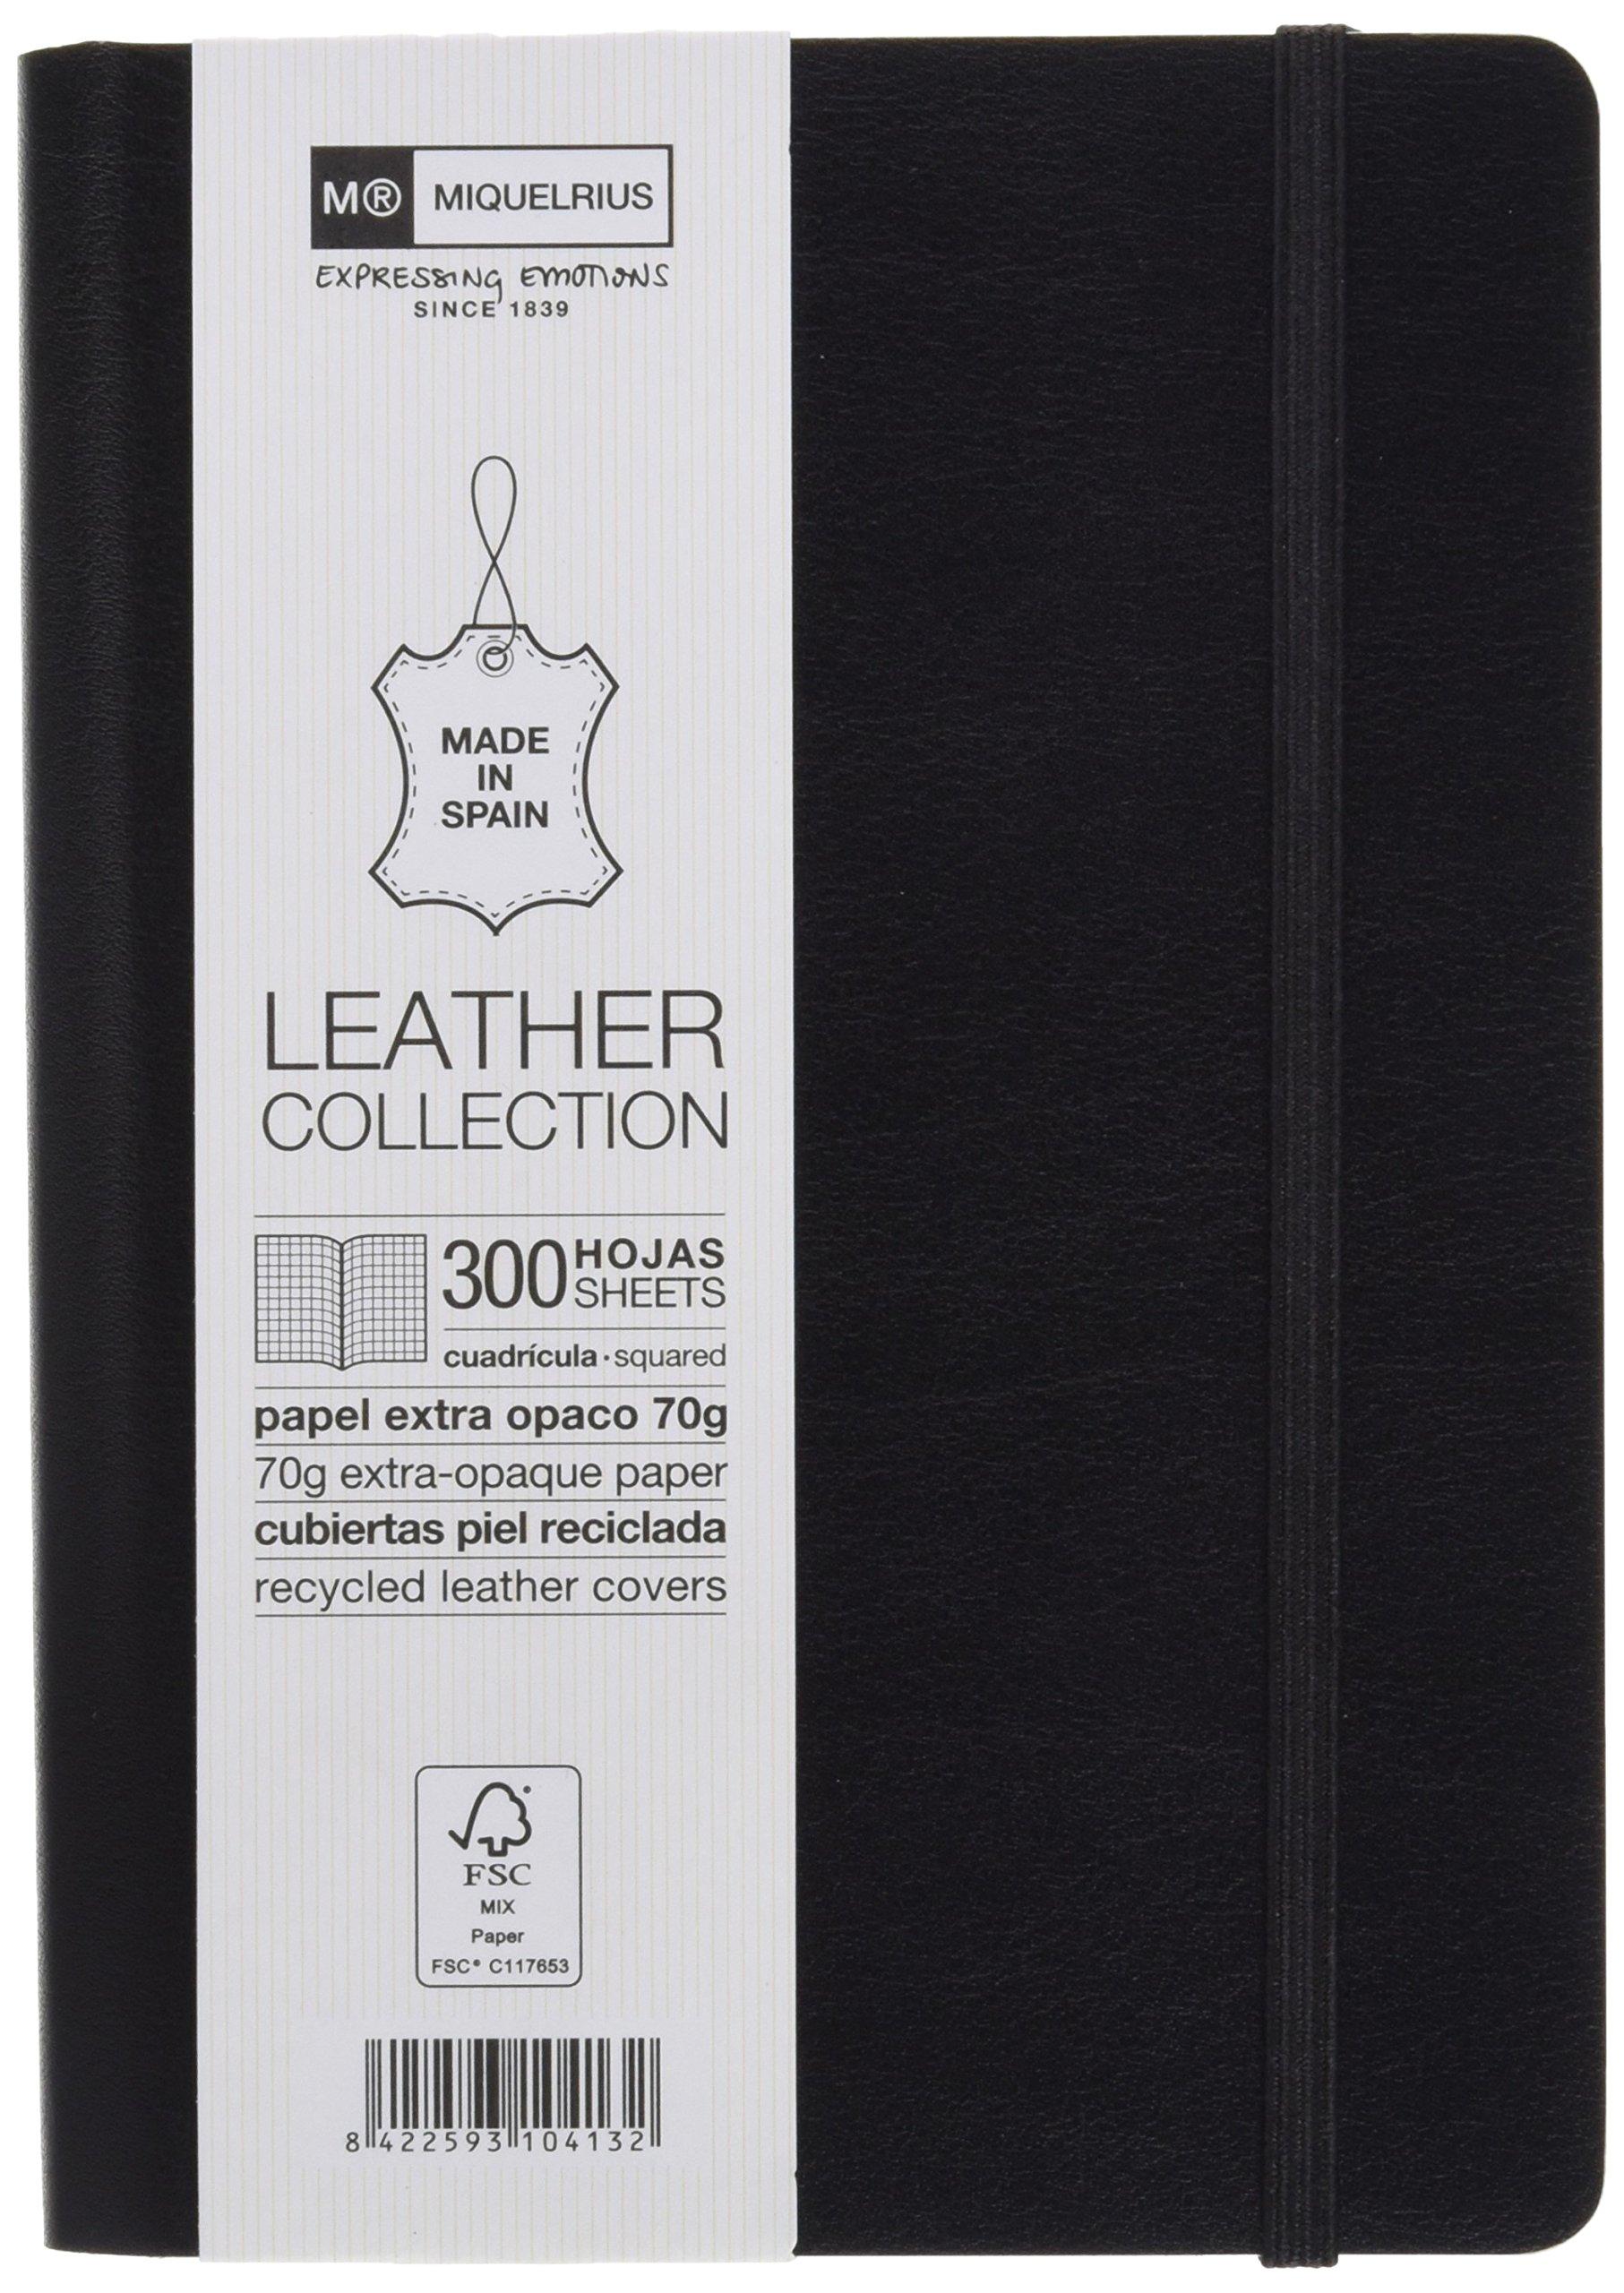 Miquelrius Flexible Handmade Leather Journal, 300 Graph Sheets/600 Pages, Black (4.5 x 6) (Black)